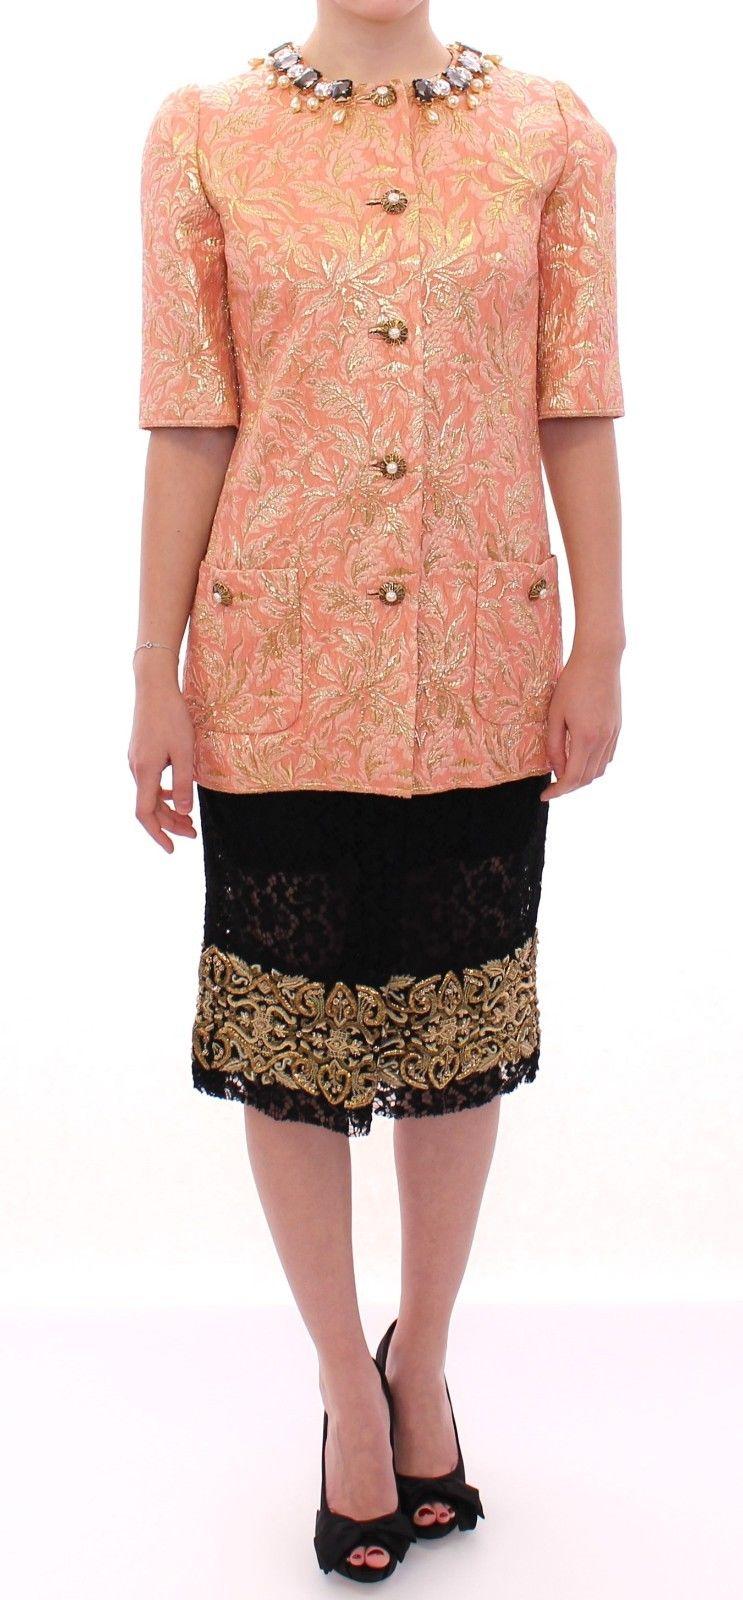 Dolce & Gabbana Women's Silk Brocade Crystal Jacket Coat Pink GSS11674 - IT40|S